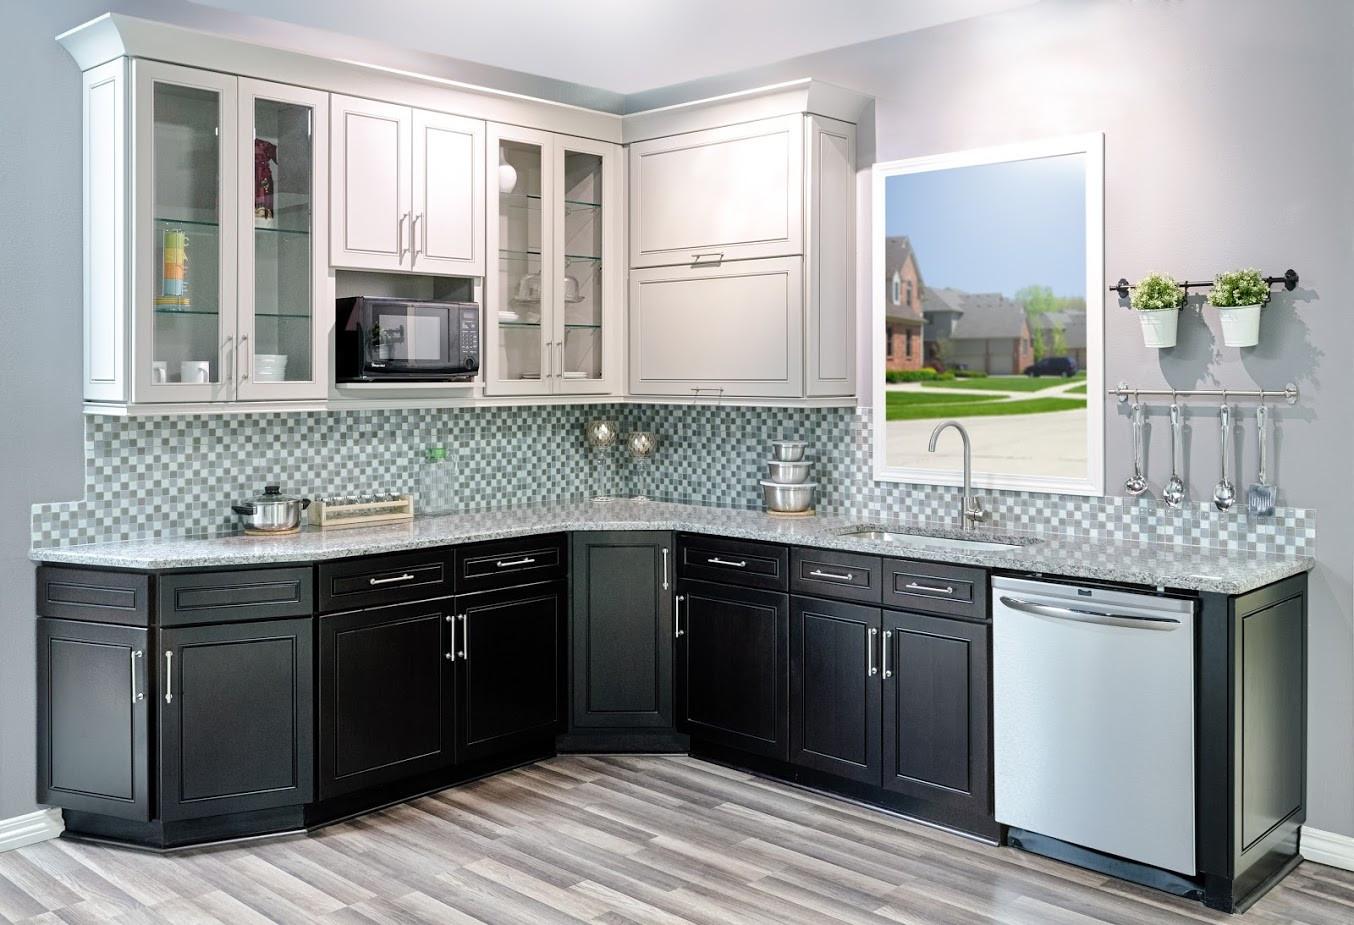 Kitchen Remodelers San Antonio  Kitchen & Bathroom Remodeling Service